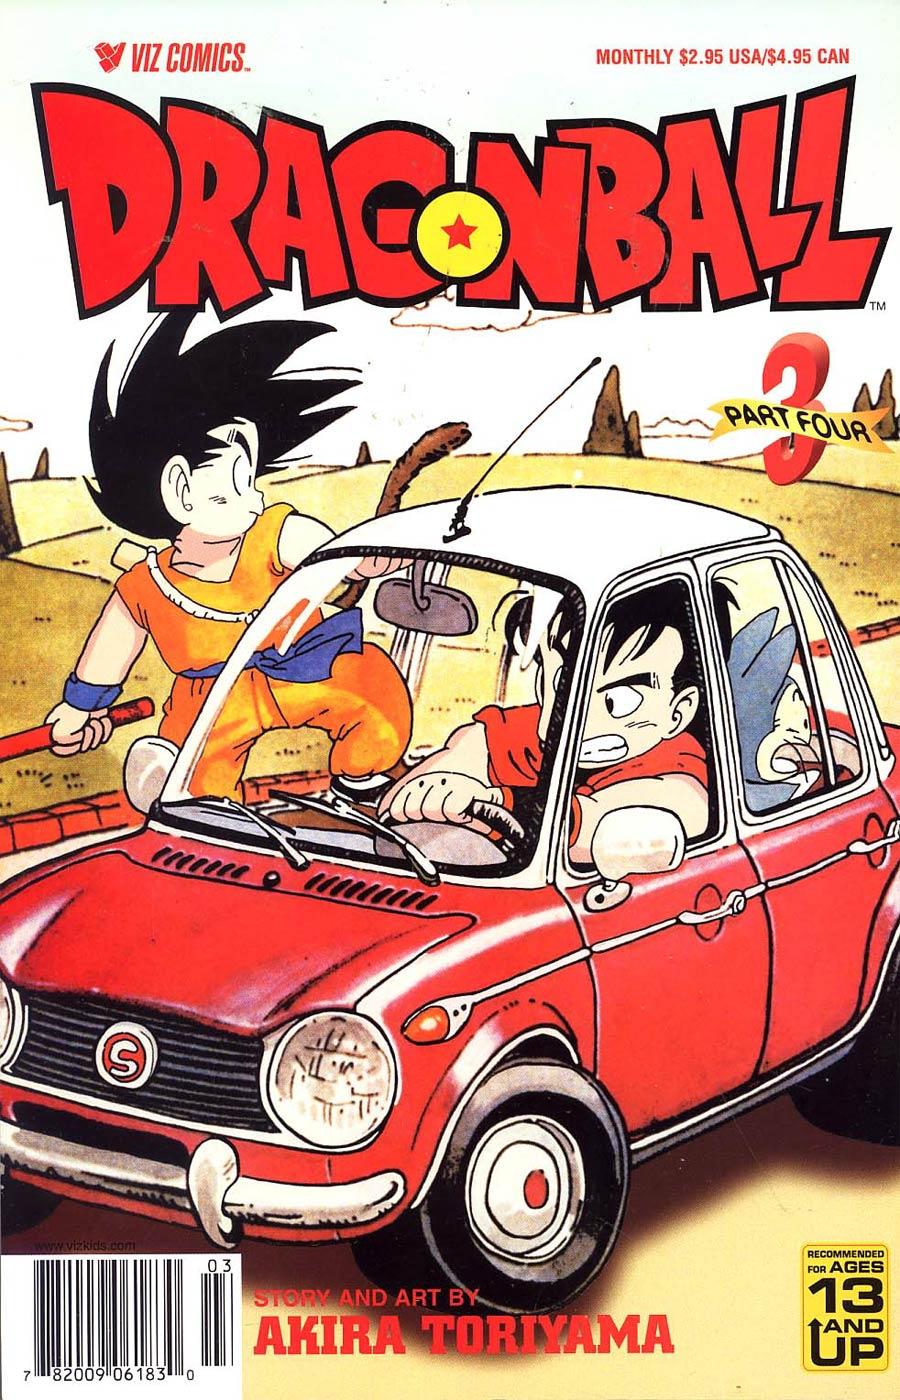 Dragon Ball Part 4 #3